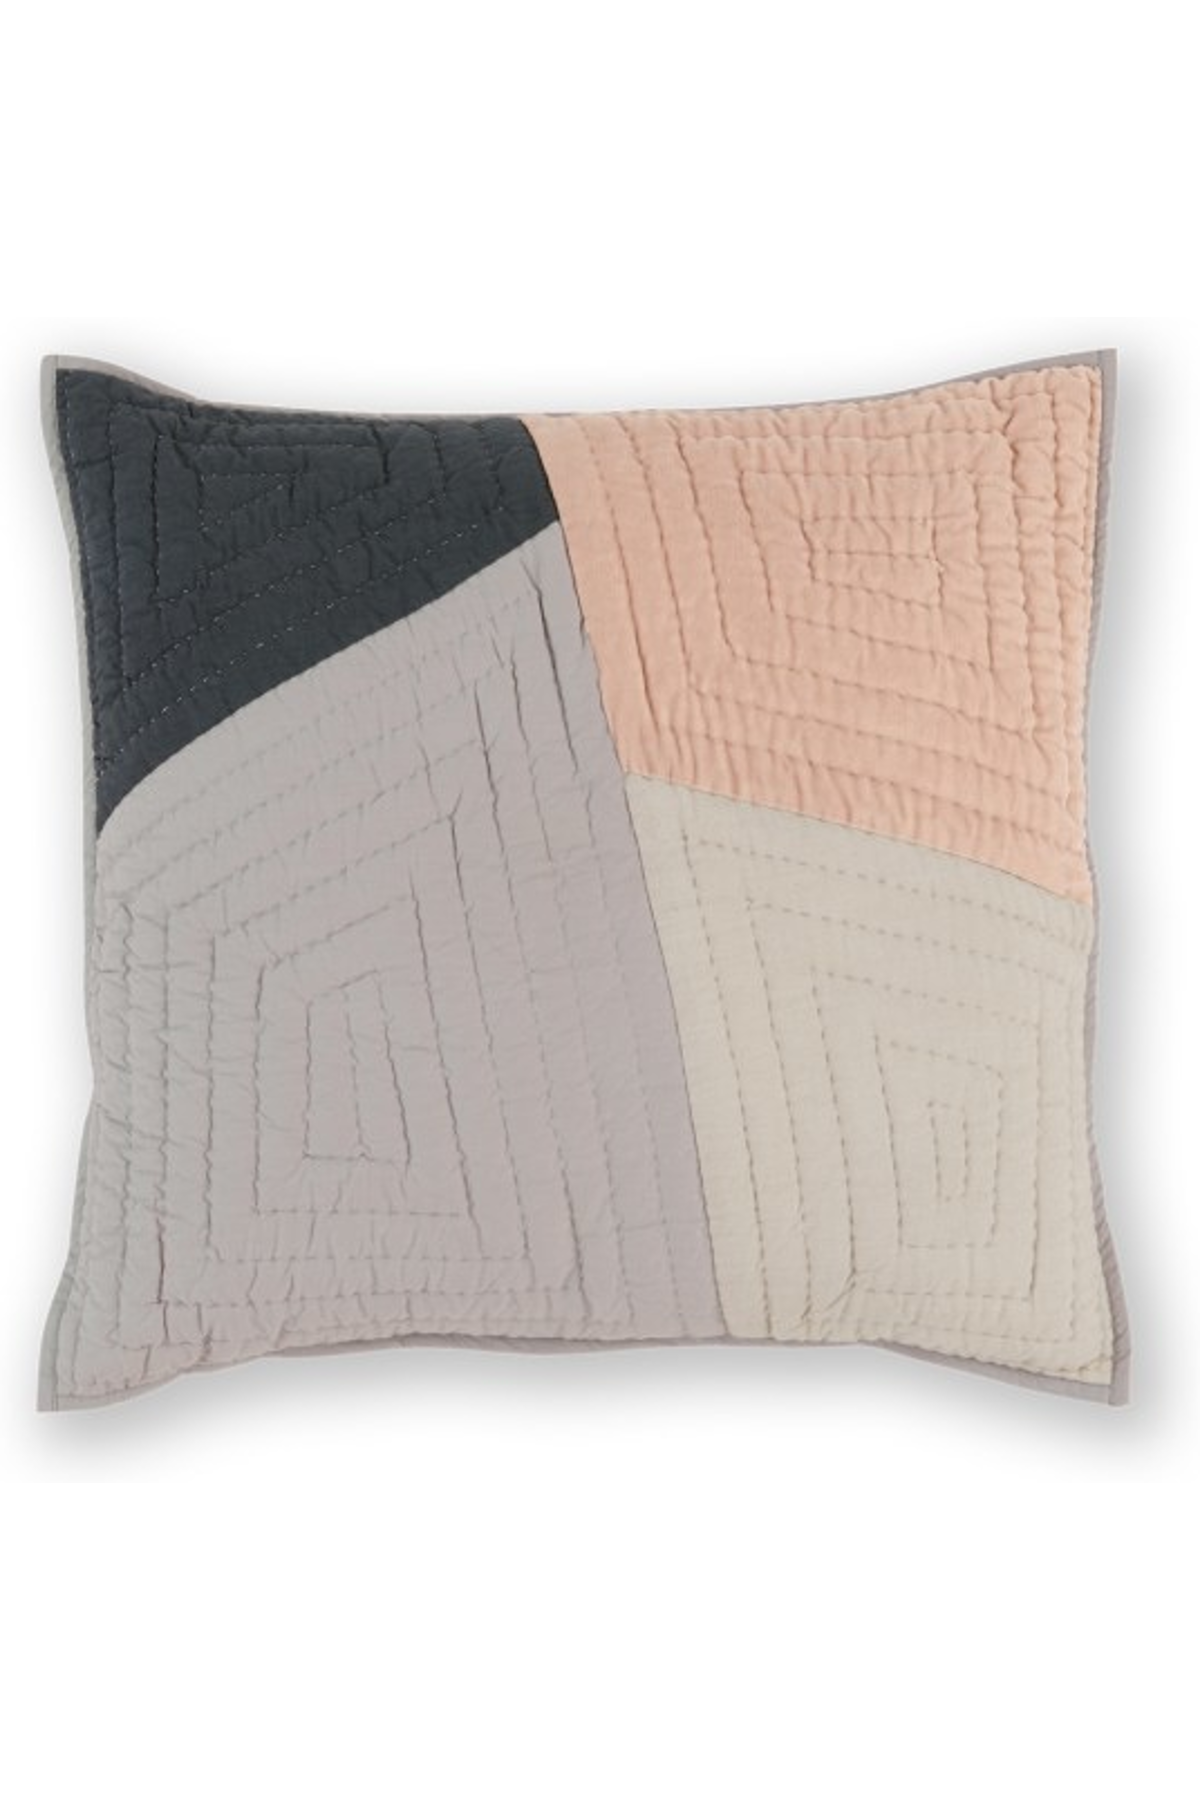 Made Grey Pink Cushion In 2020 Patchwork Cushion Pink Cushions Grey Cushions